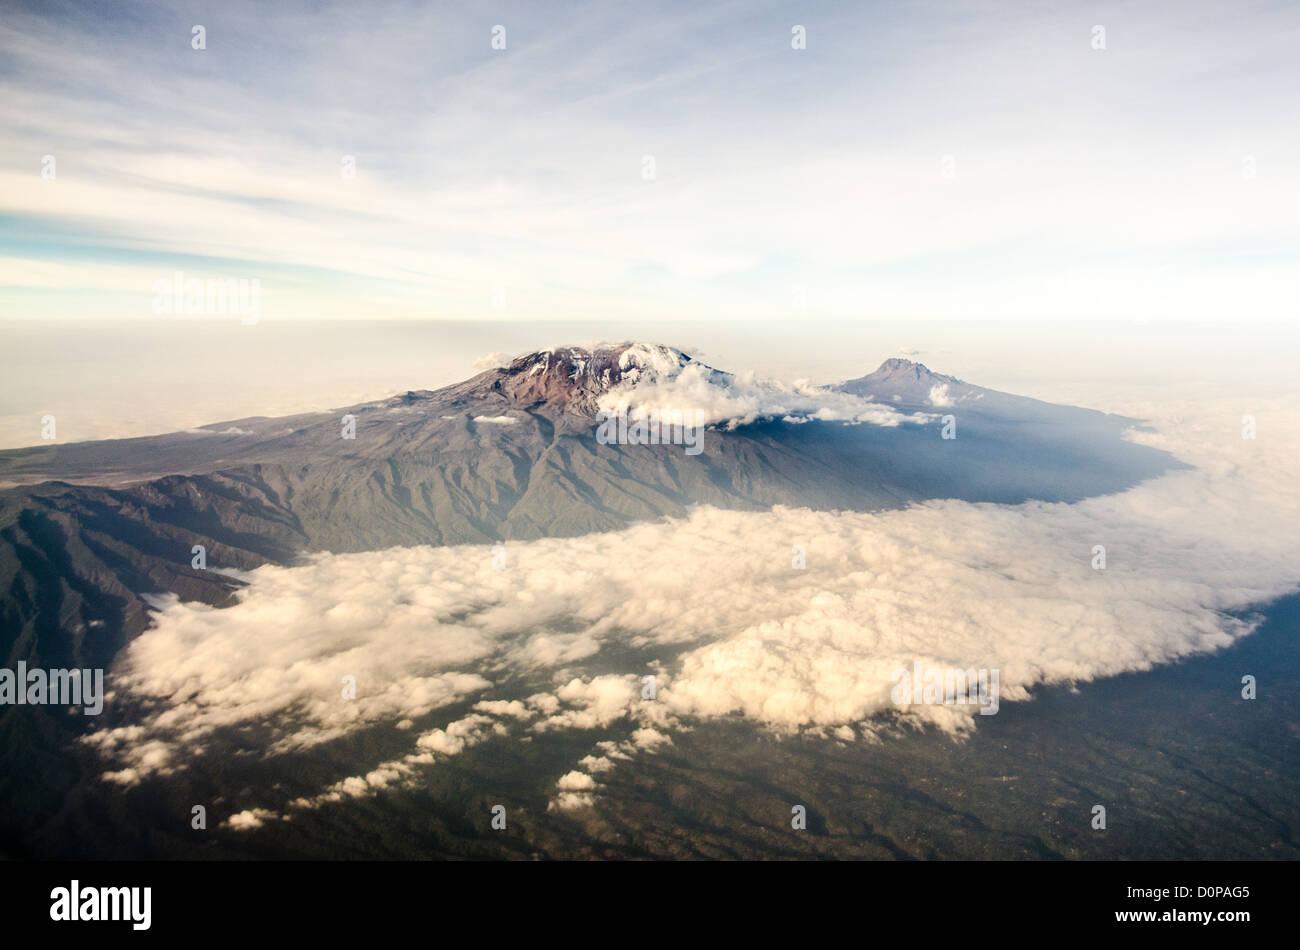 MT KILIMANJARO, Tanzania - Mount Kilimanjaro Aerial View Summit. An aerial view of Mount Kilimanjaro, the highest - Stock Image